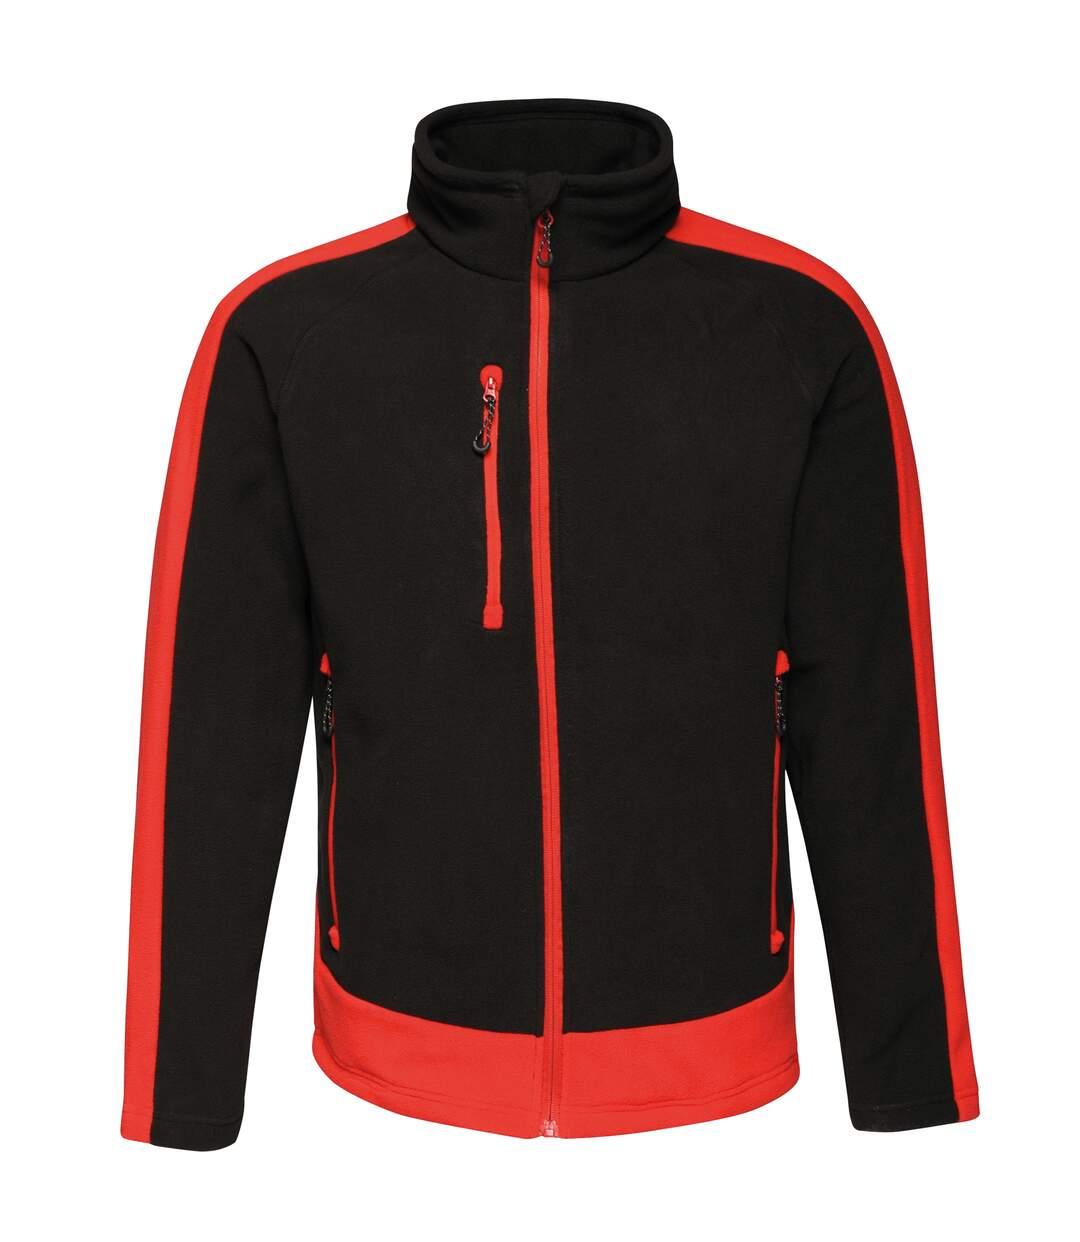 Regatta Contrast Mens 300 Fleece Top/Jacket (Black/Classic Red) - UTRW6352